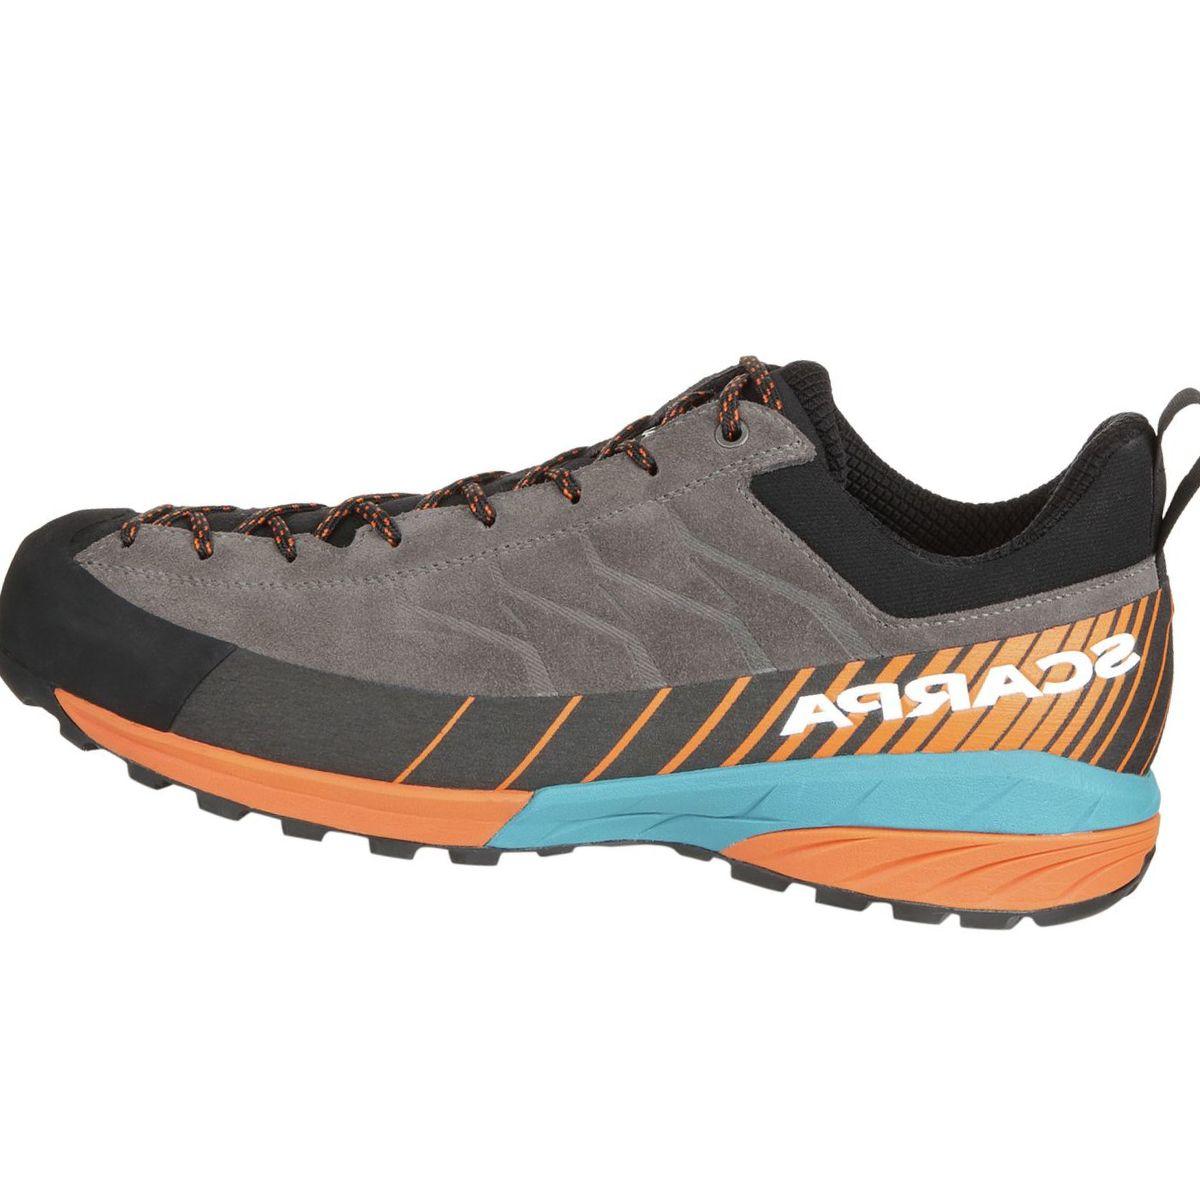 Scarpa Mescalito Shoe - Men's